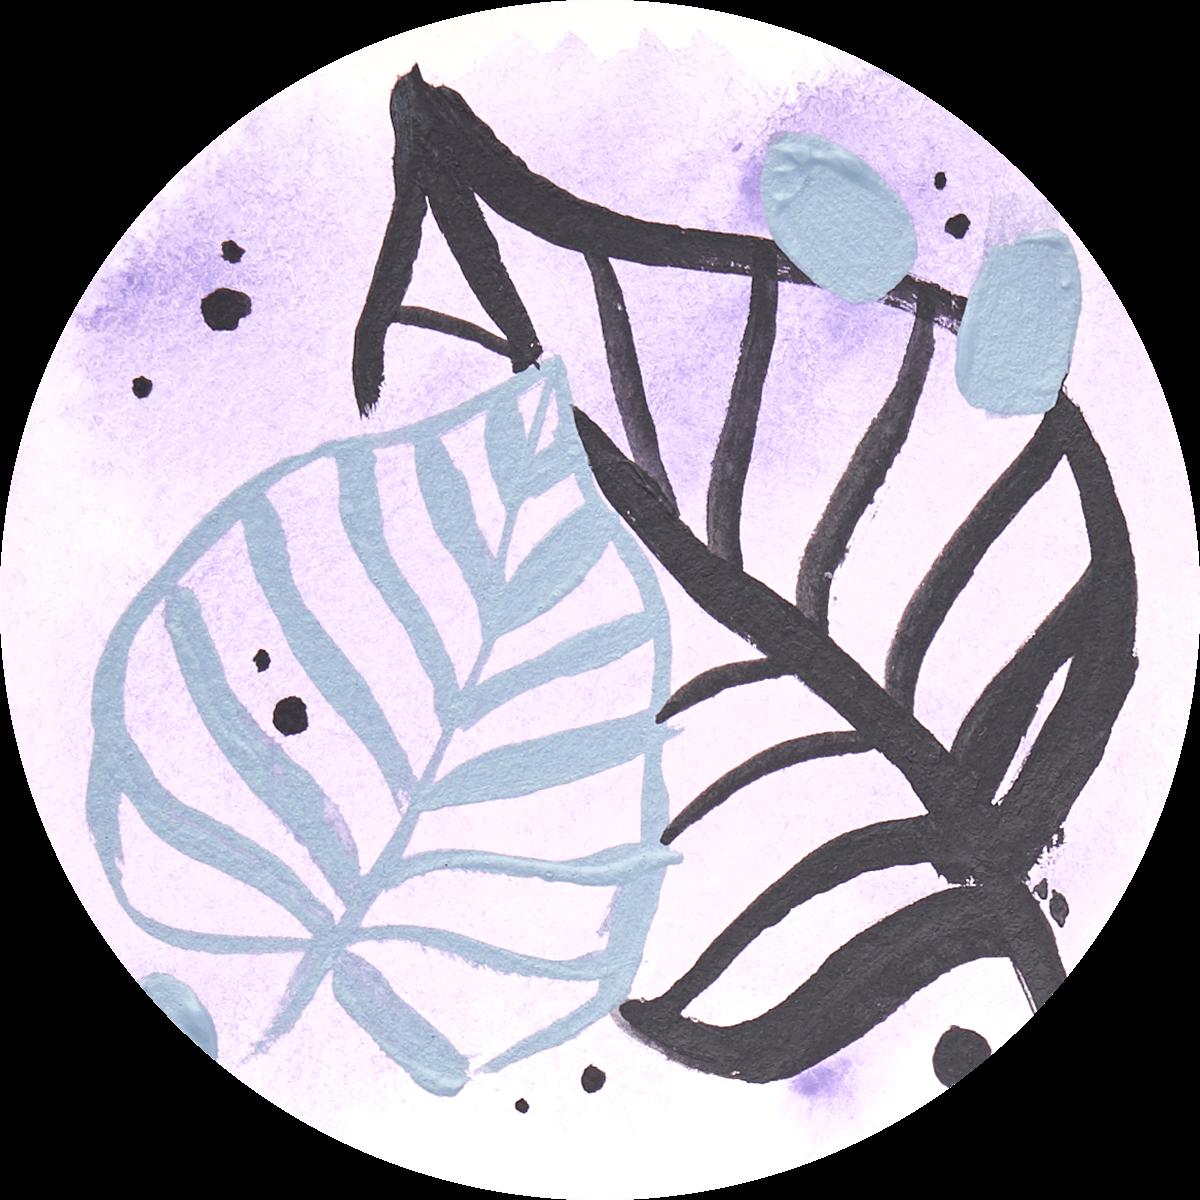 Watercolor + Acrylic Technique